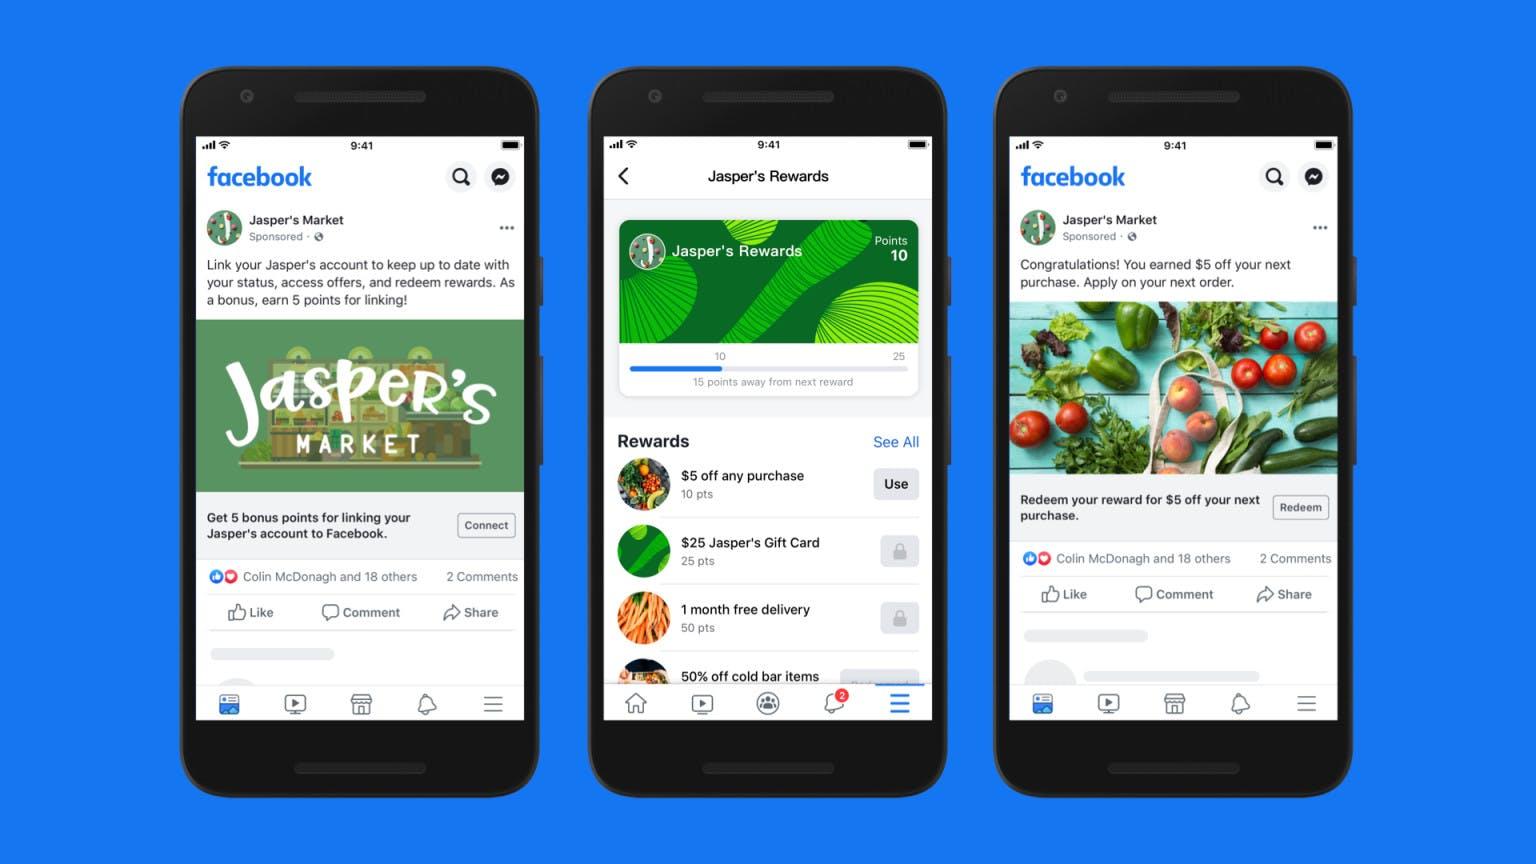 facebook shops programma fedeltà e raccolta punti